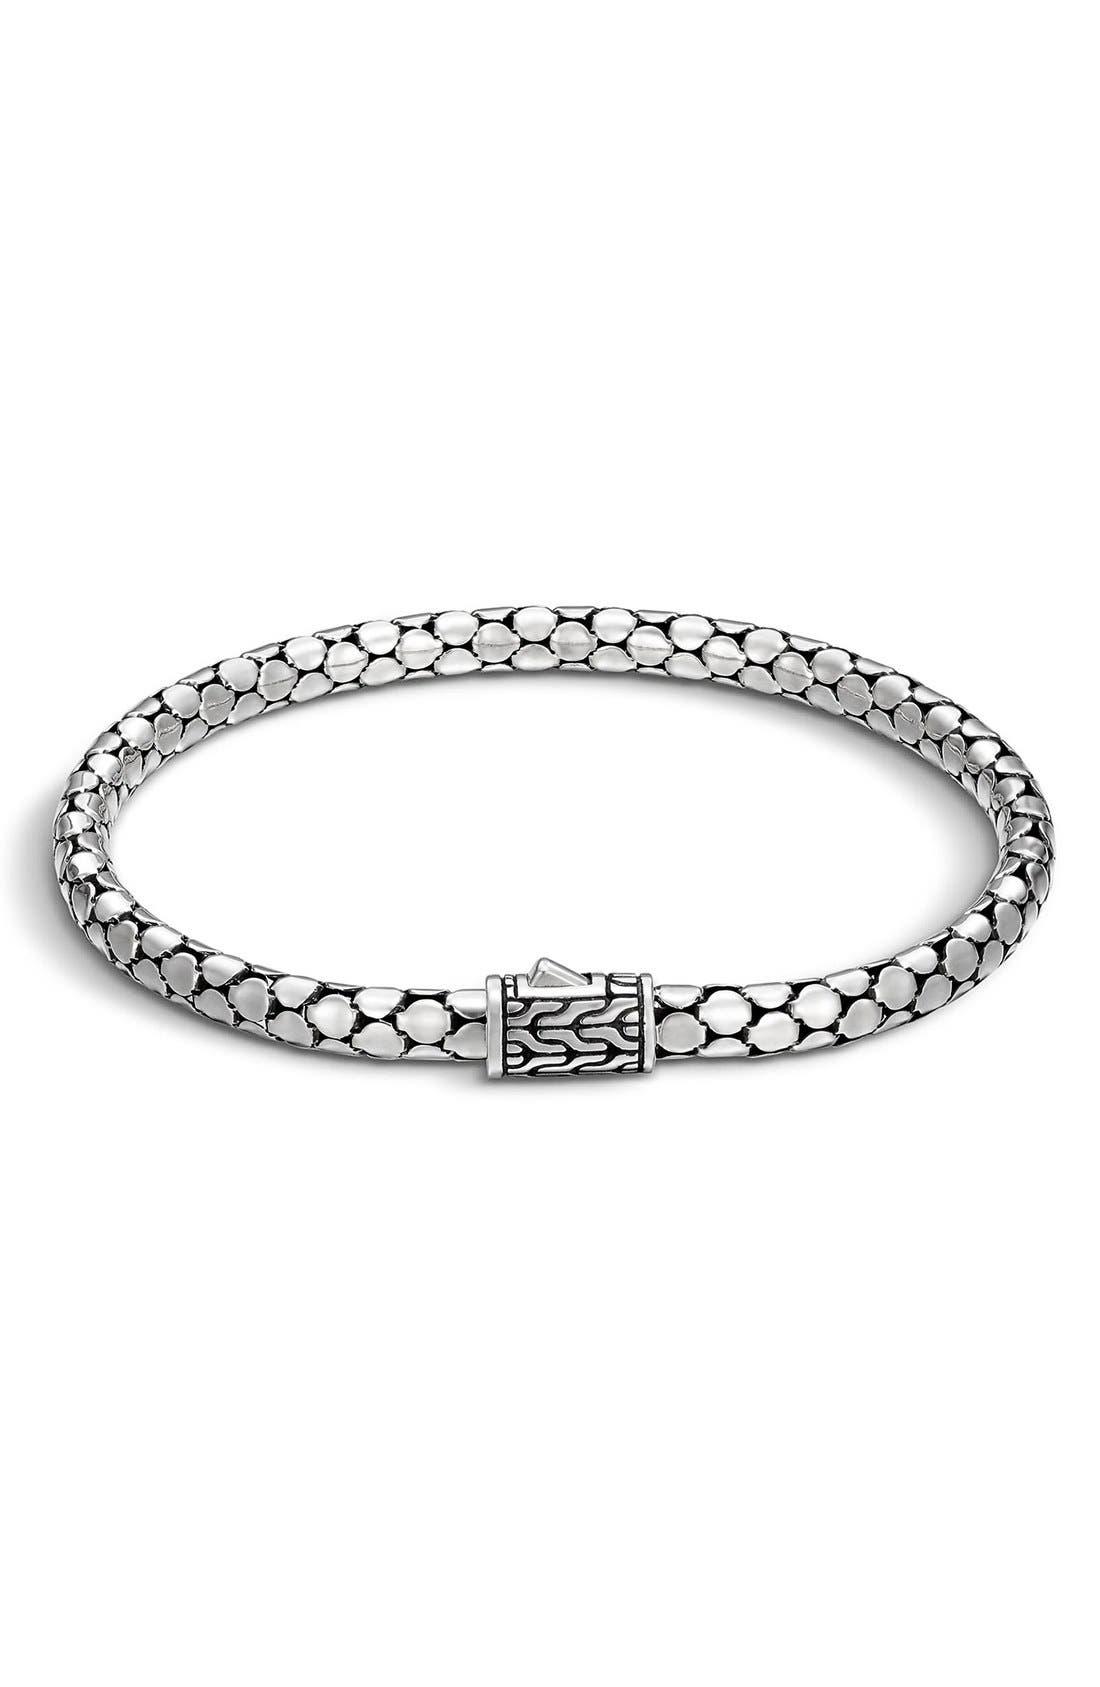 Main Image - John Hardy Dot Chain Bracelet